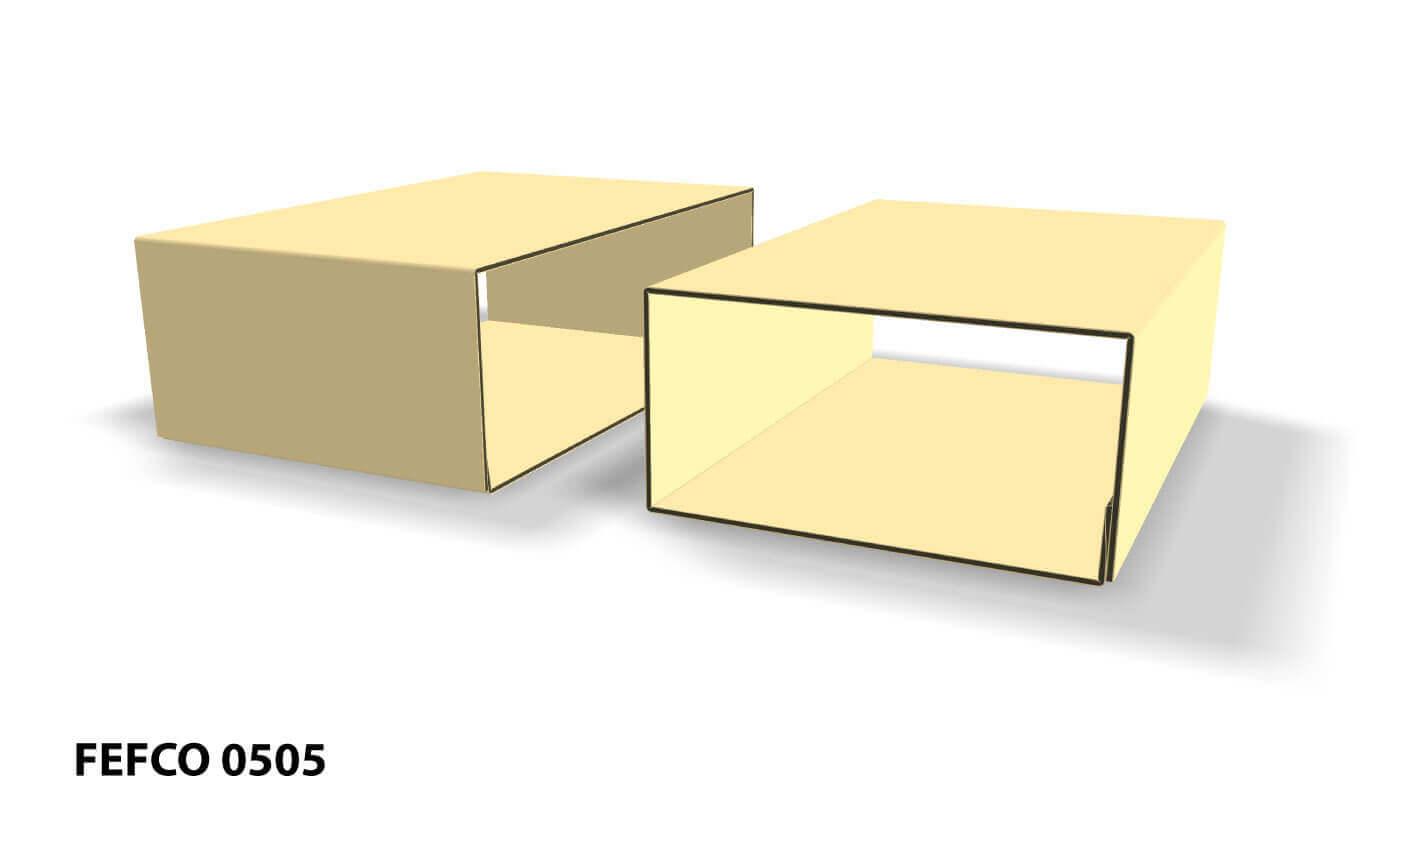 Imagen 3D de caja fefco 0505 deslizante